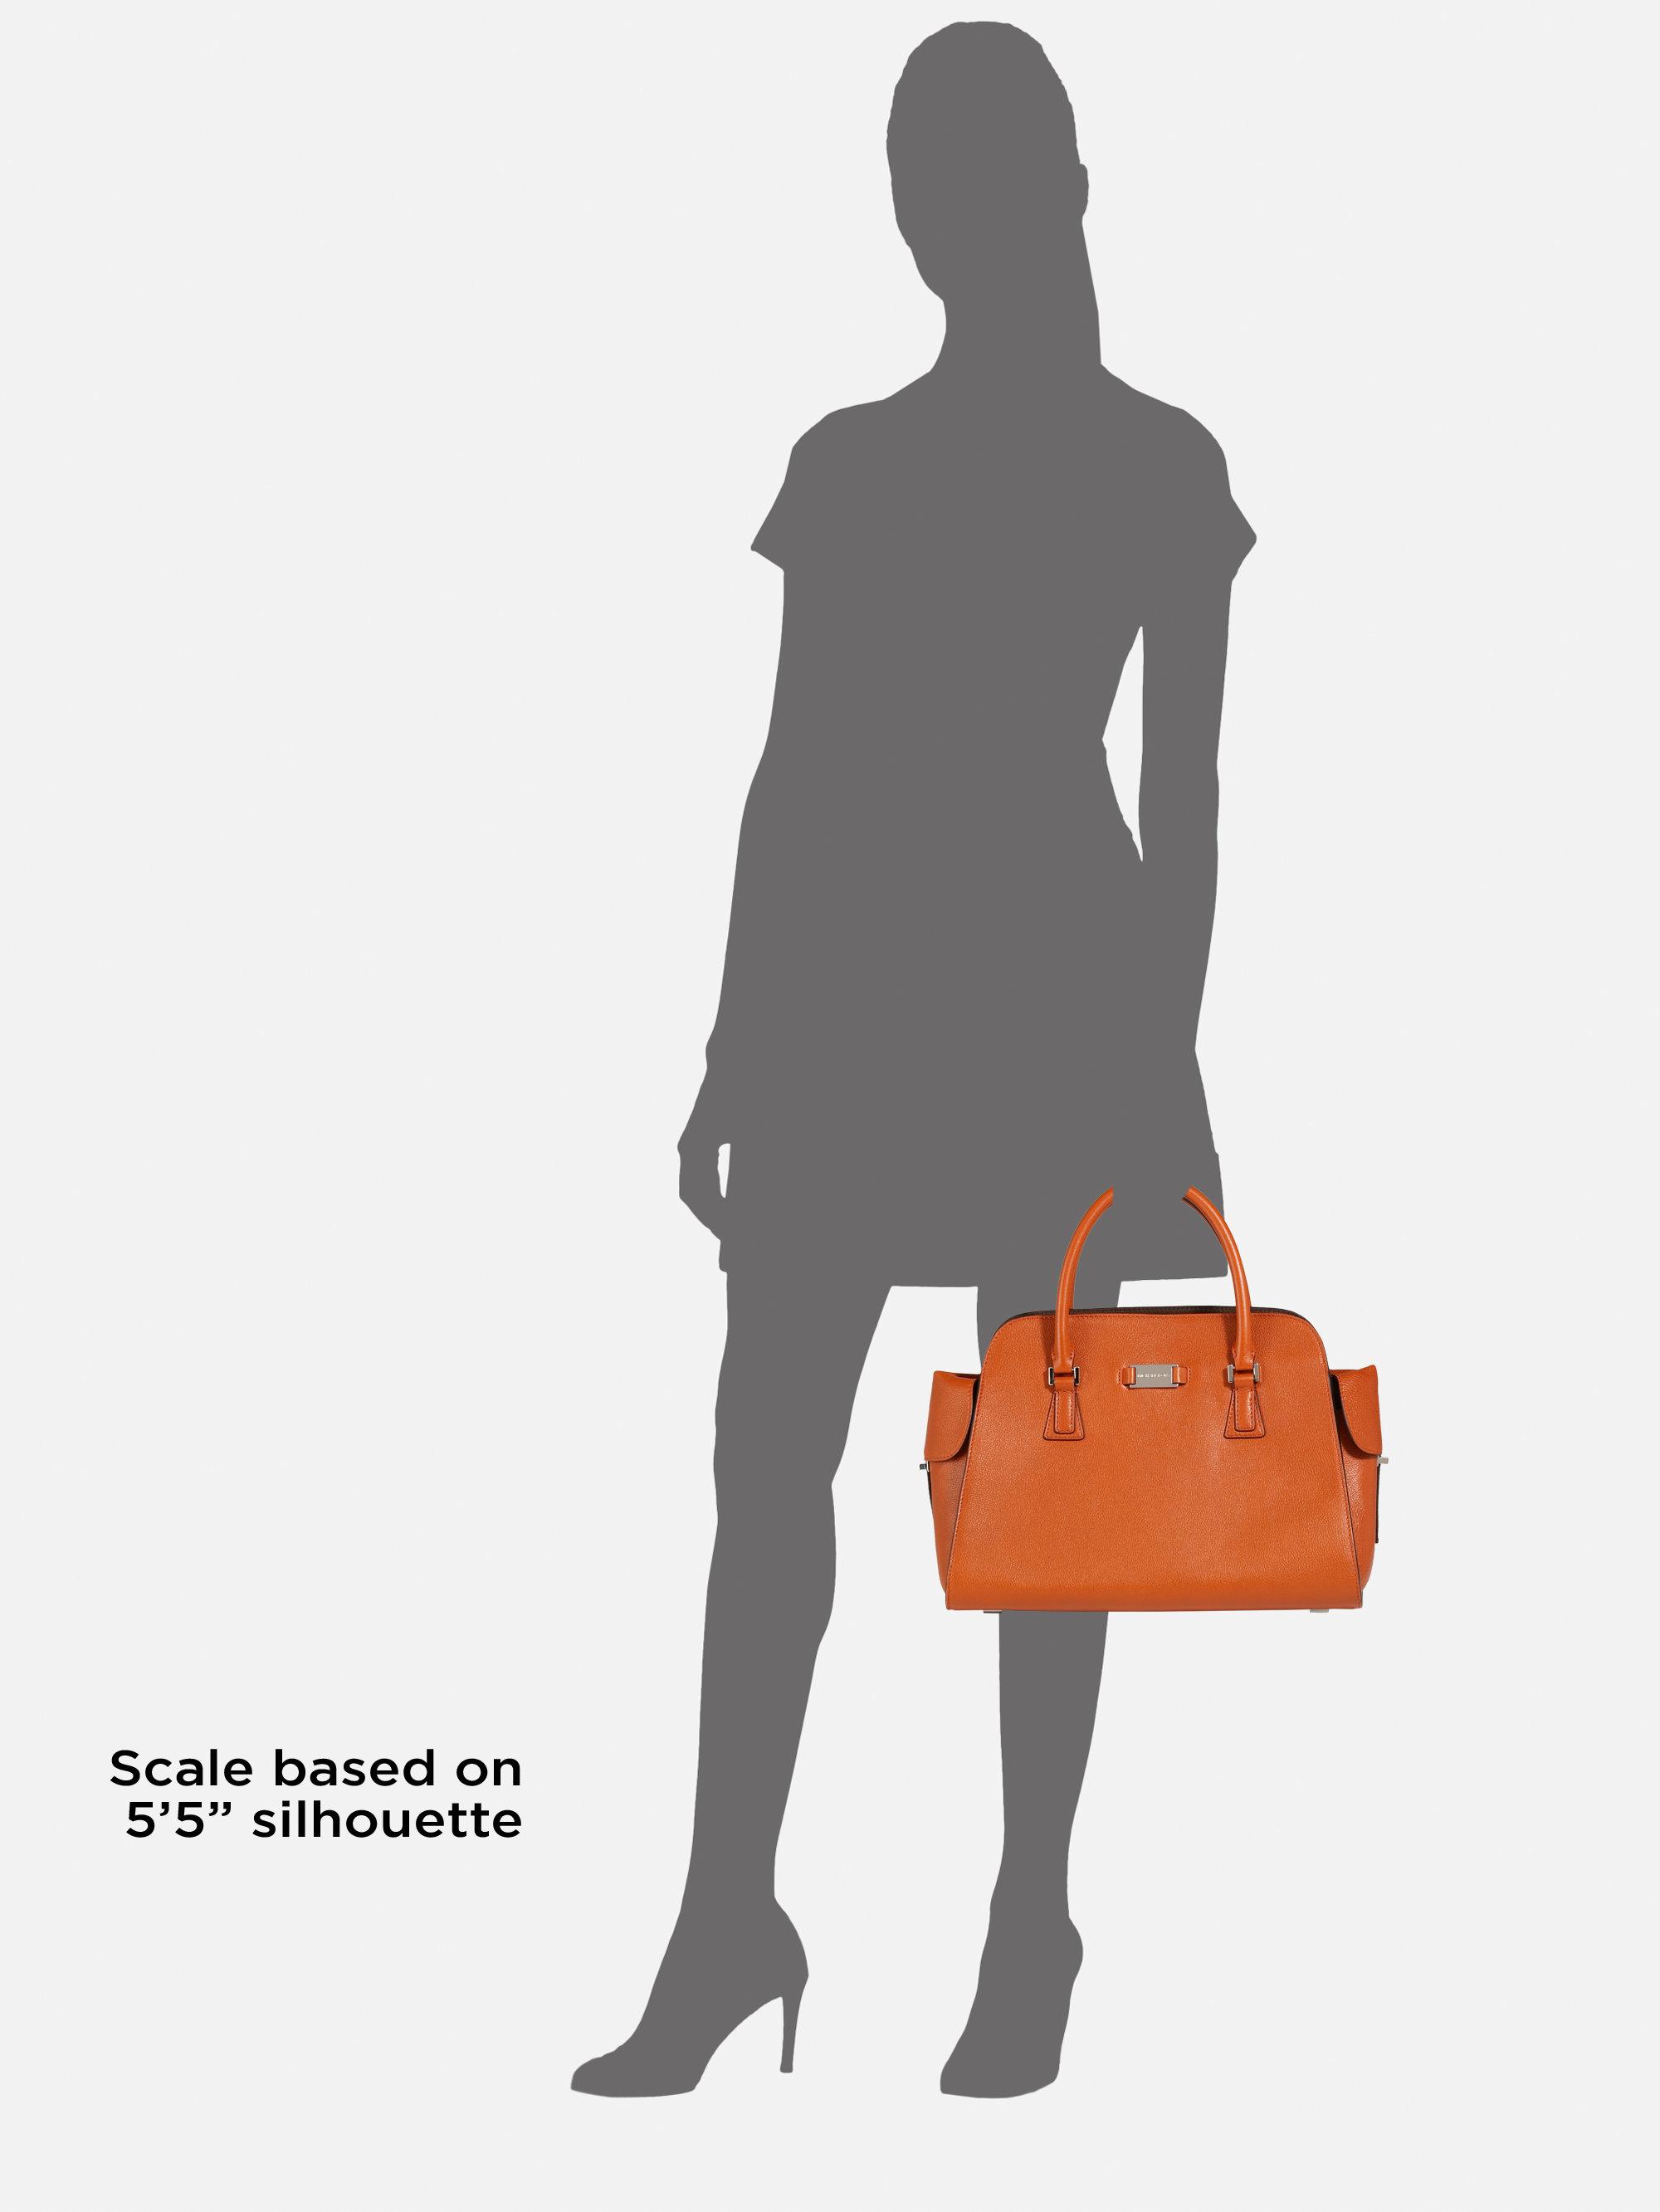 cc5173b08b681 ... new zealand lyst michael kors gia leather top handle bag in orange  5d805 5fad1